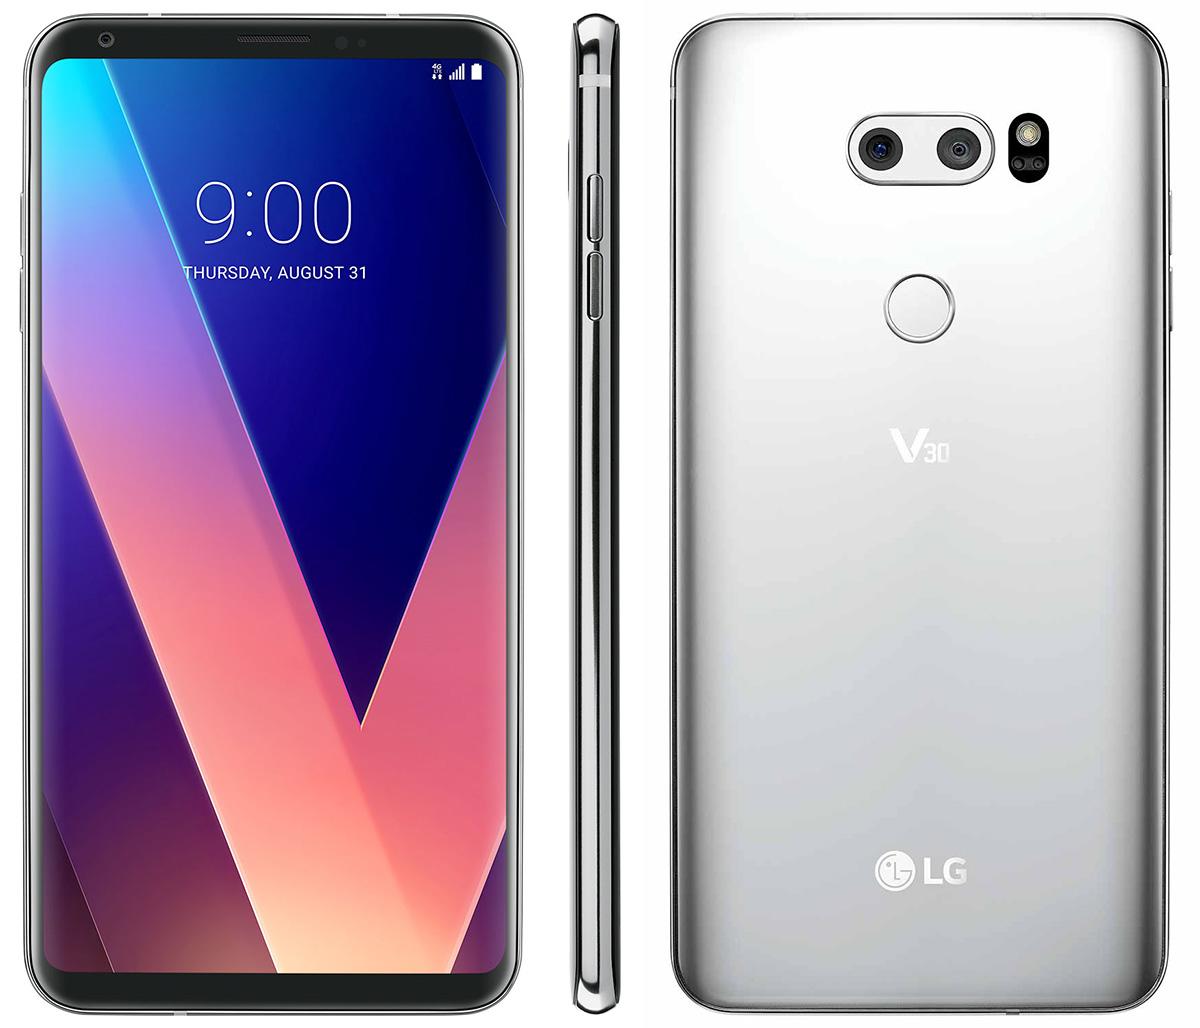 t mobile lg v30 android oreo update available using lg bridge tmonews rh tmonews com Katana Accessories Katana Phone